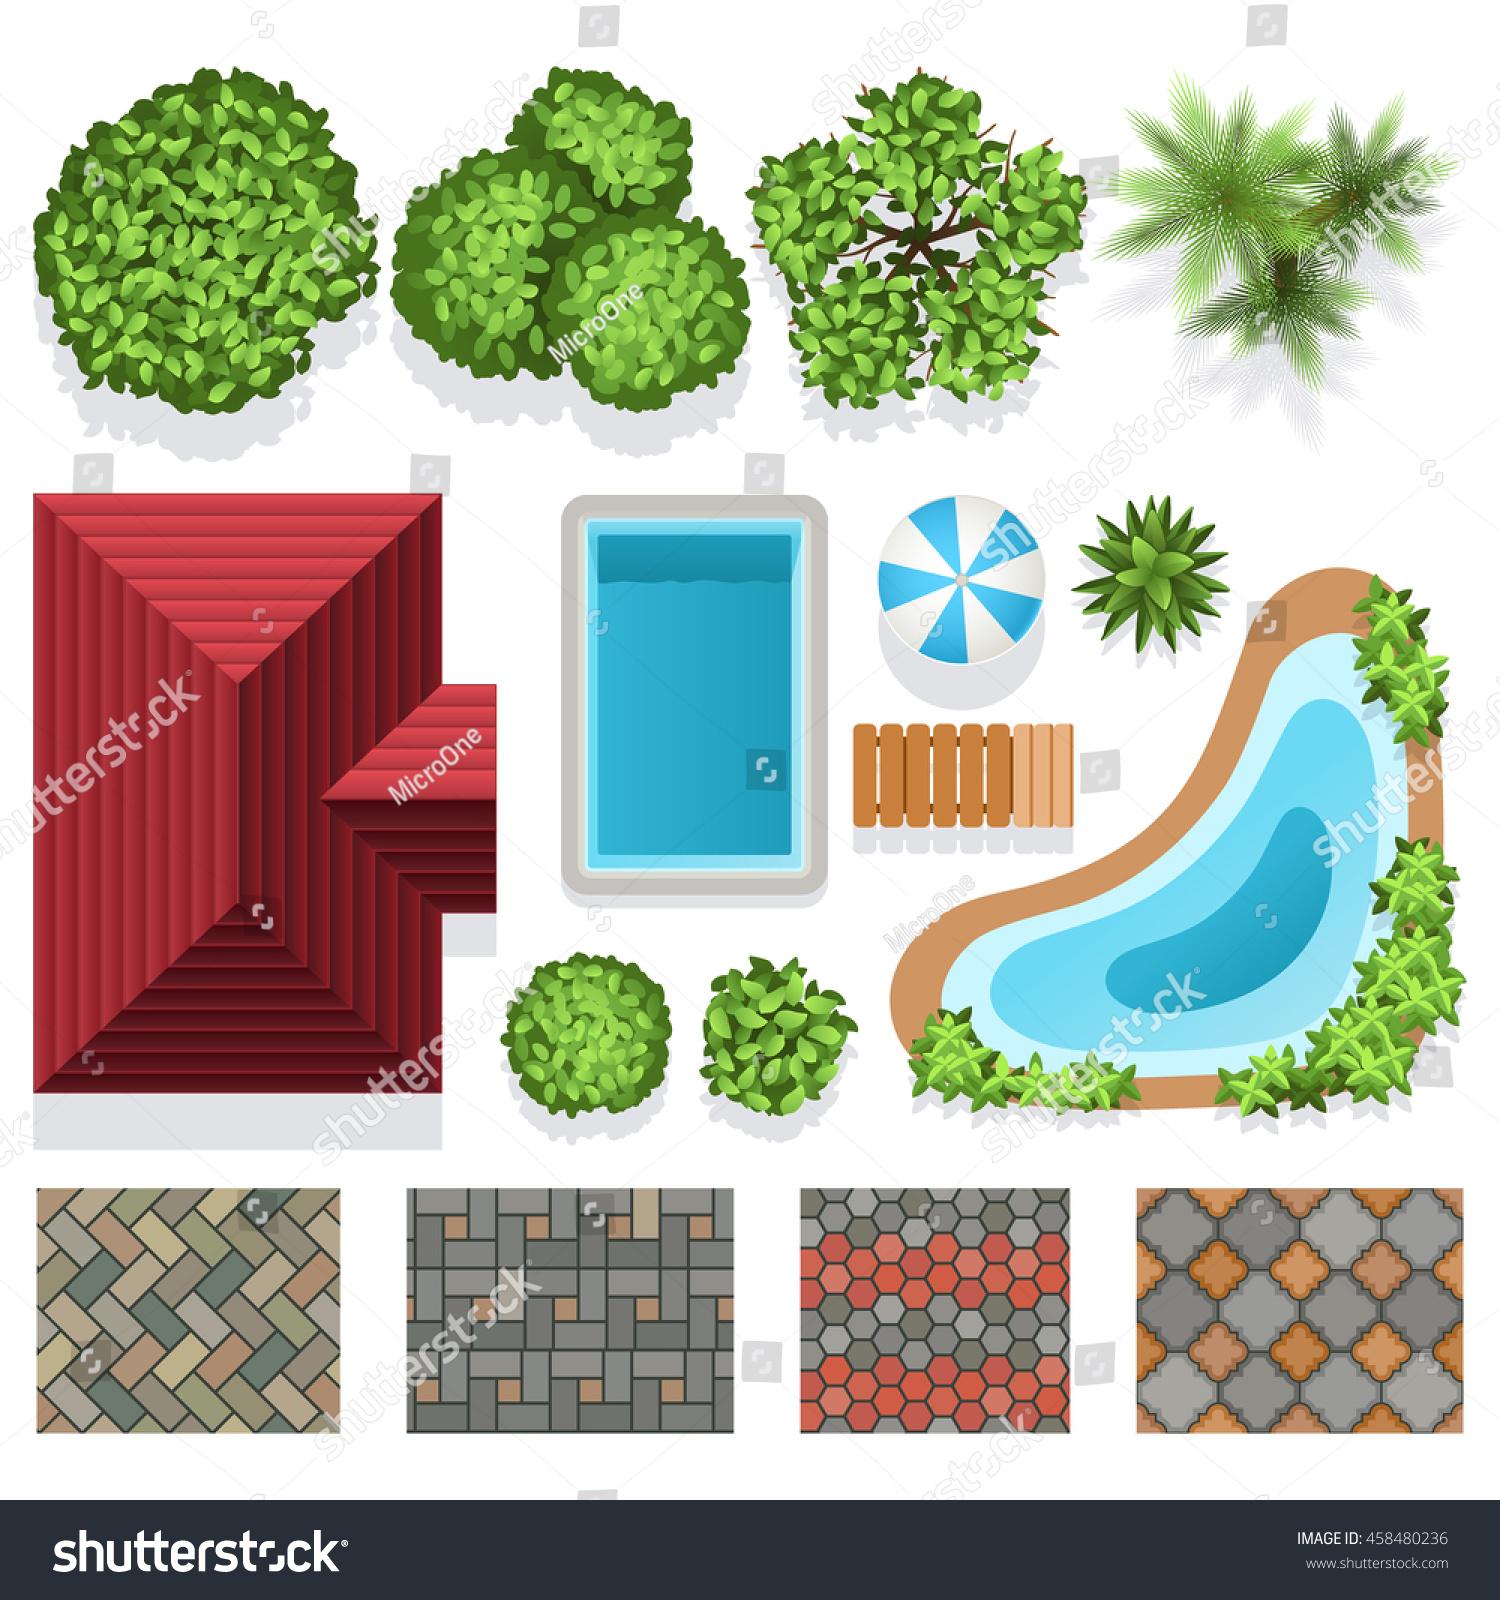 Landscape Garden Design Vector Elements Structure Stock Vector ...